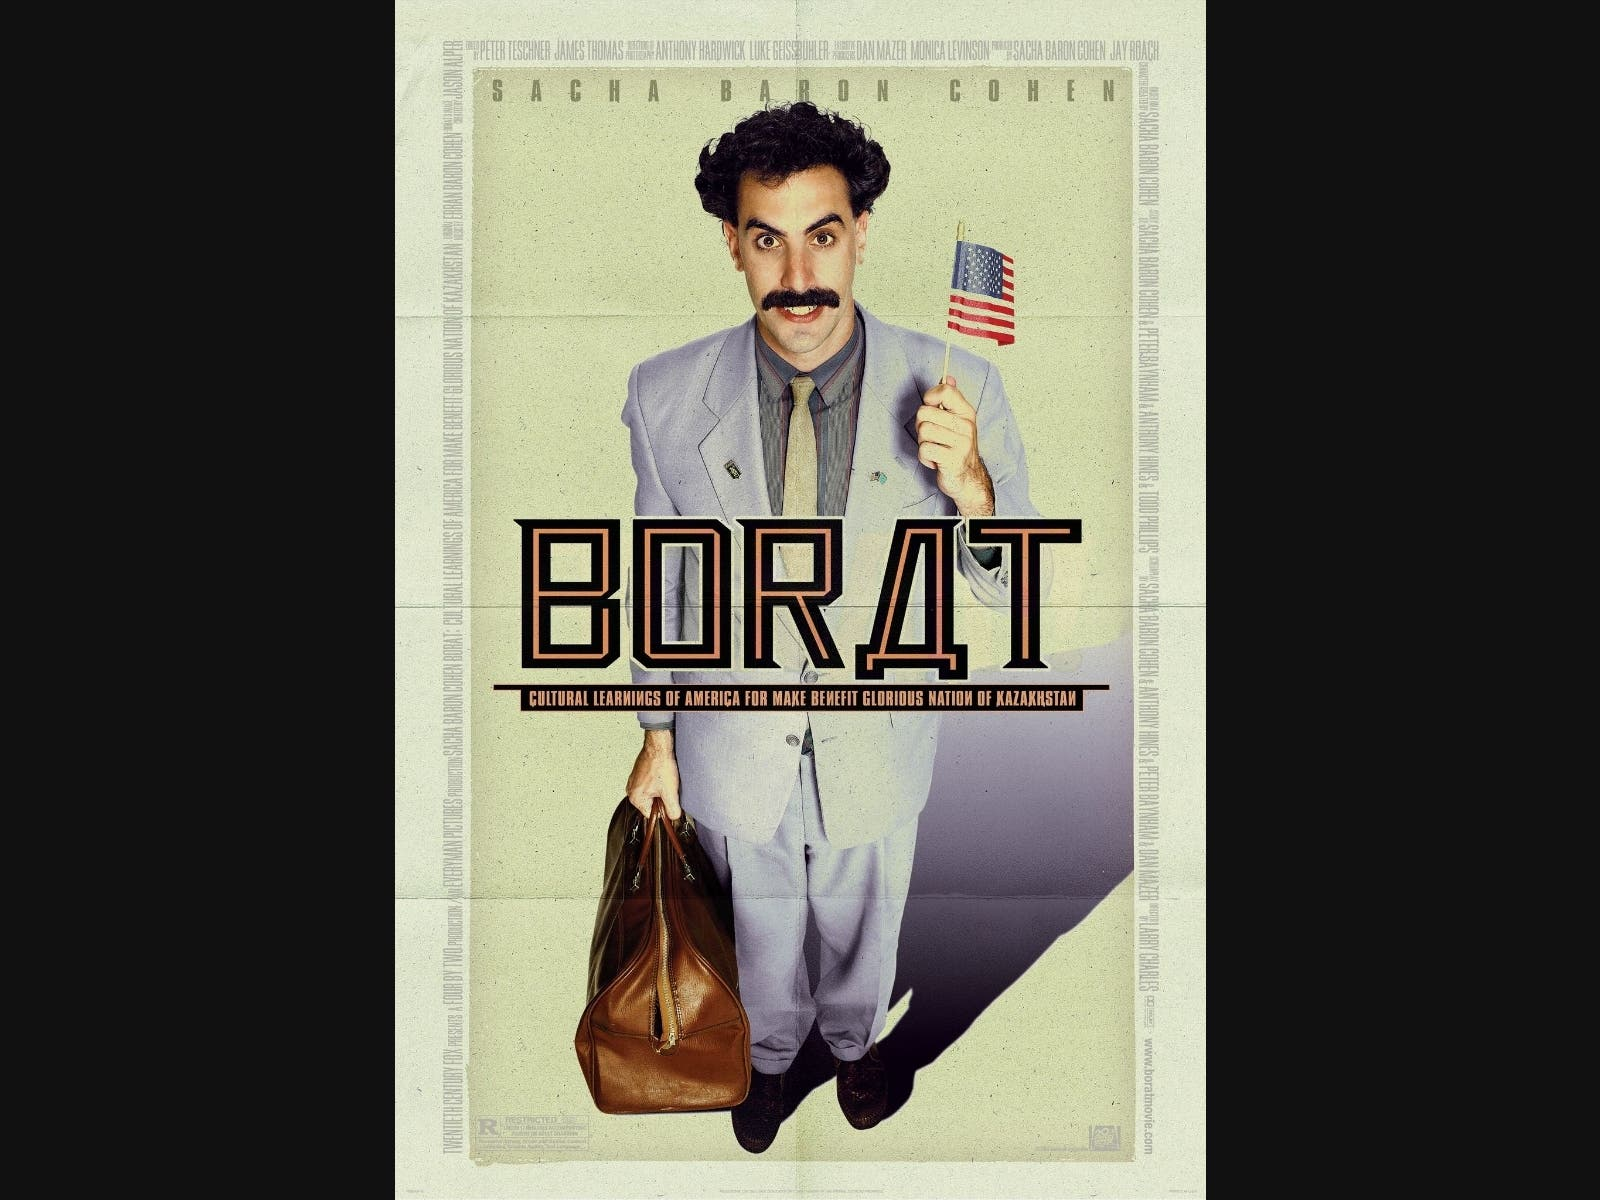 borat - photo #17